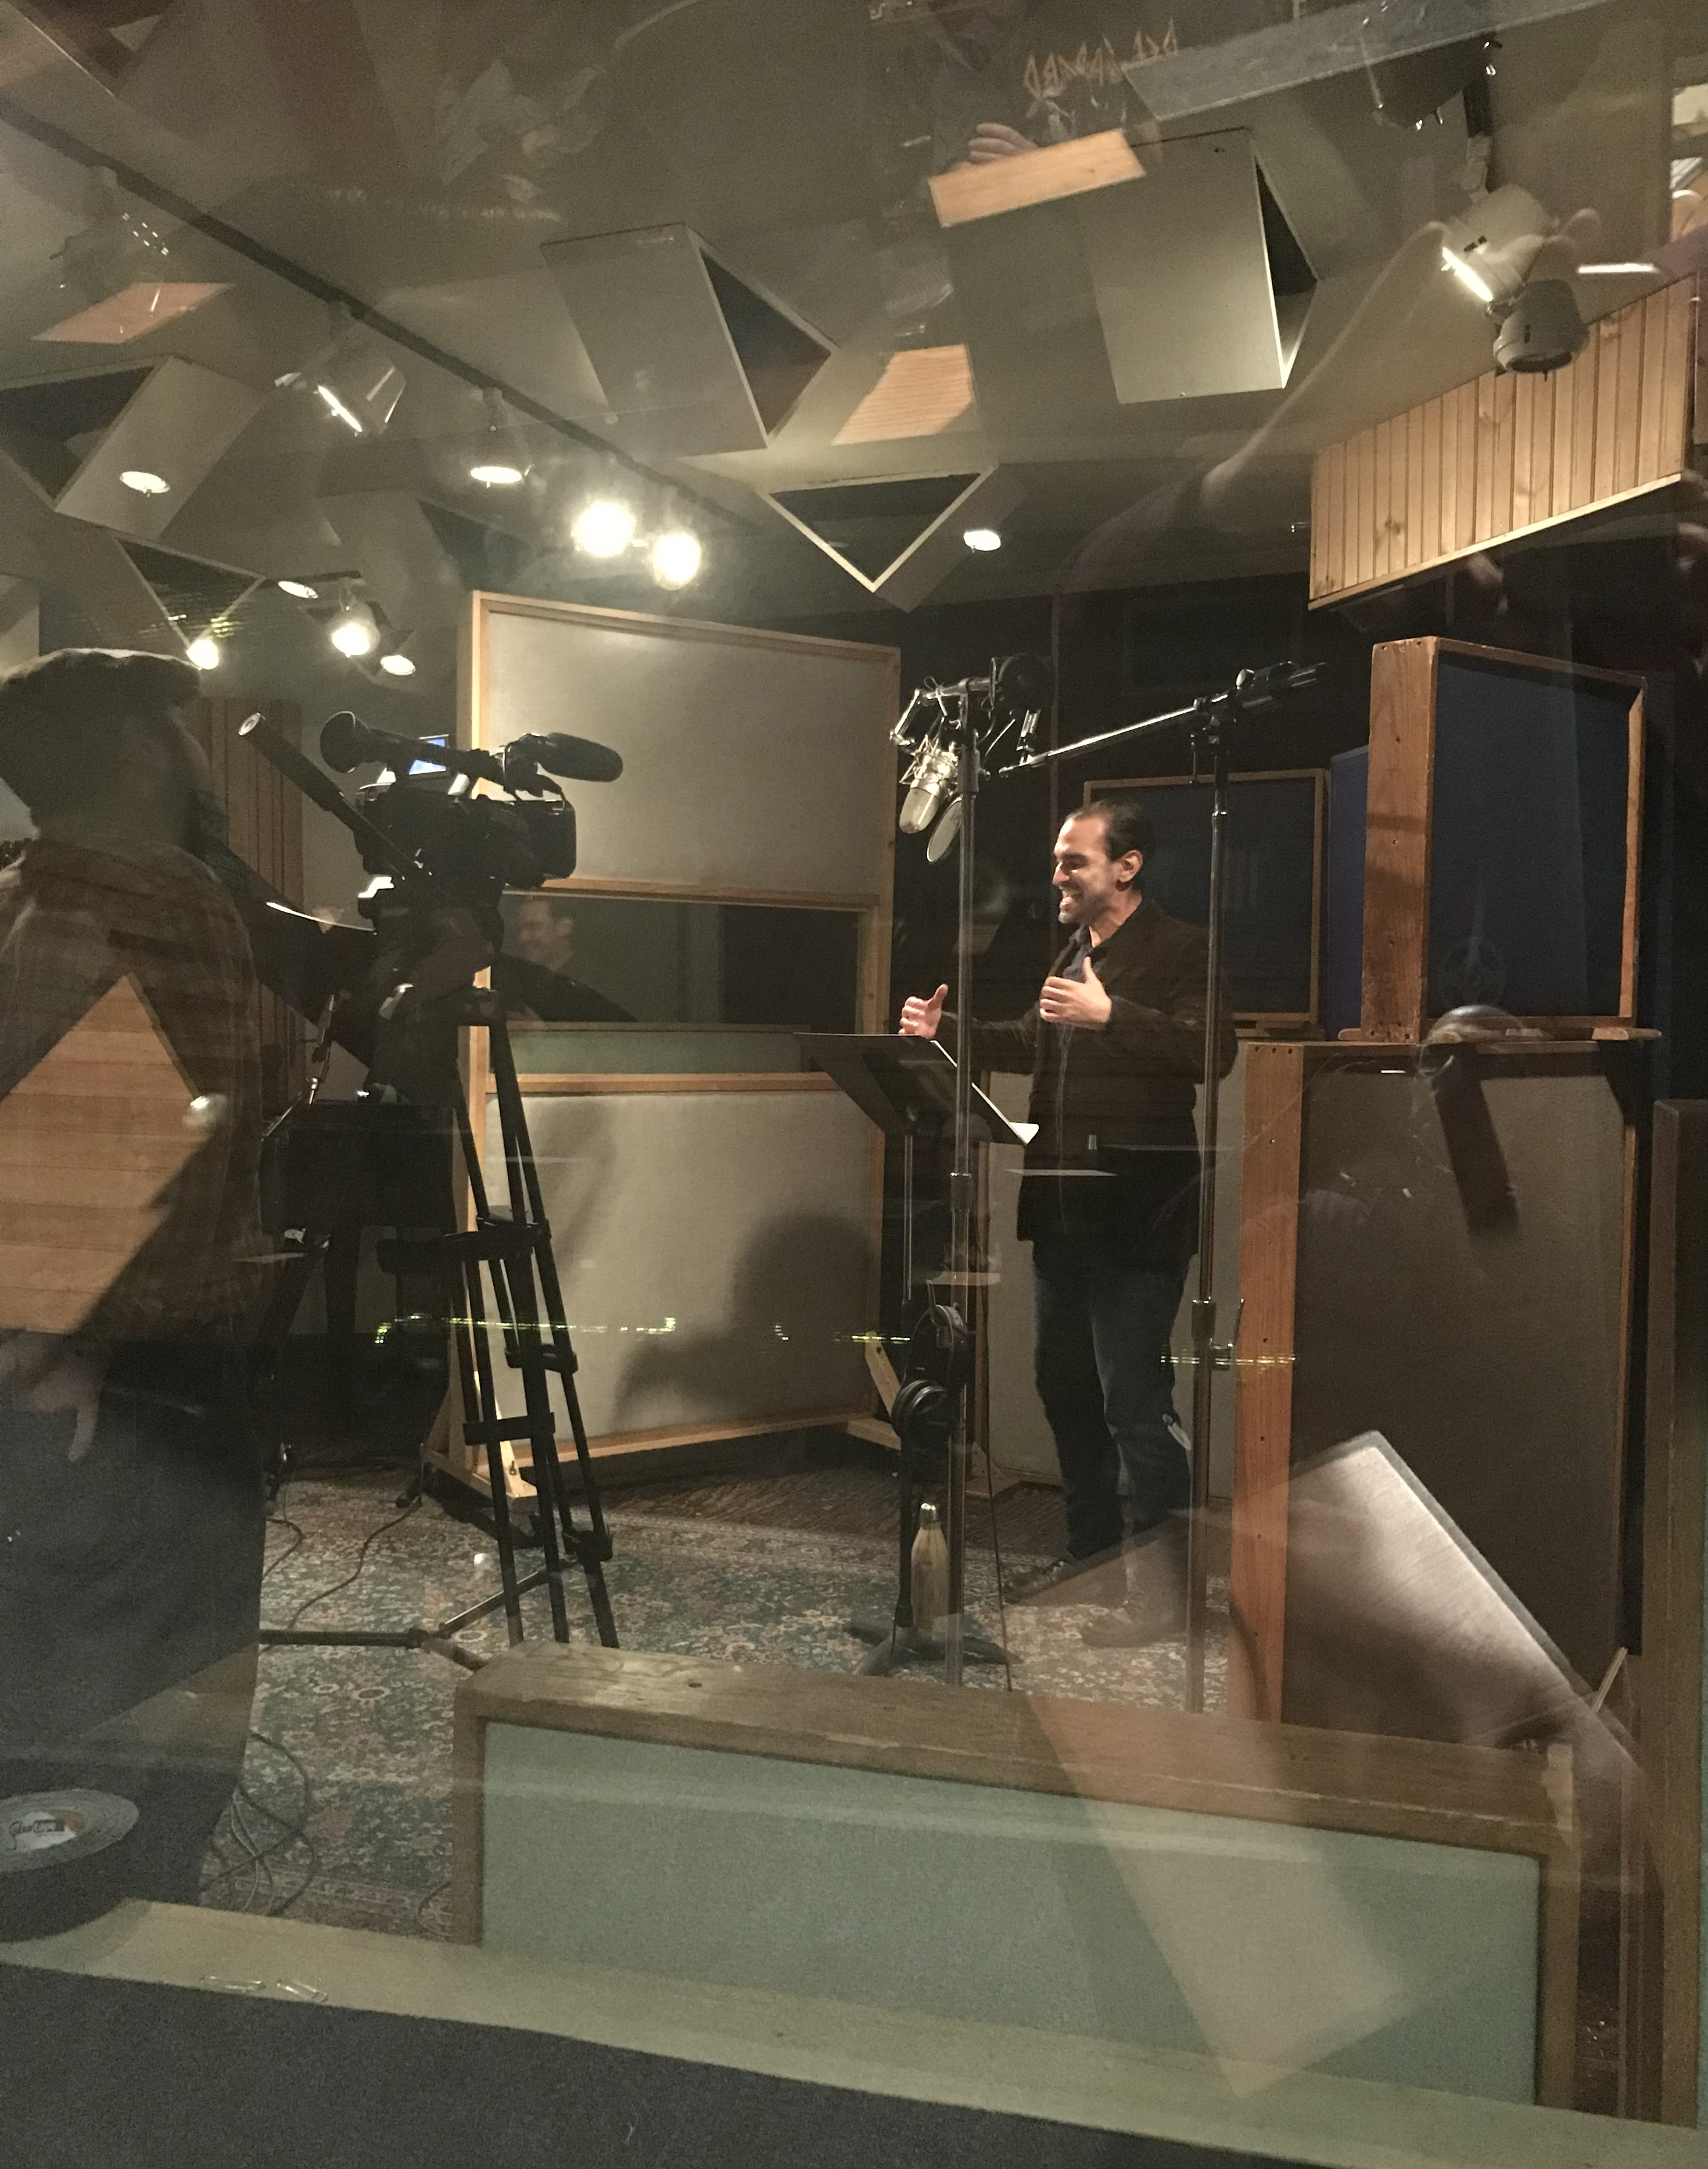 Javier Munoz recording In My Body from Breathe, 2018